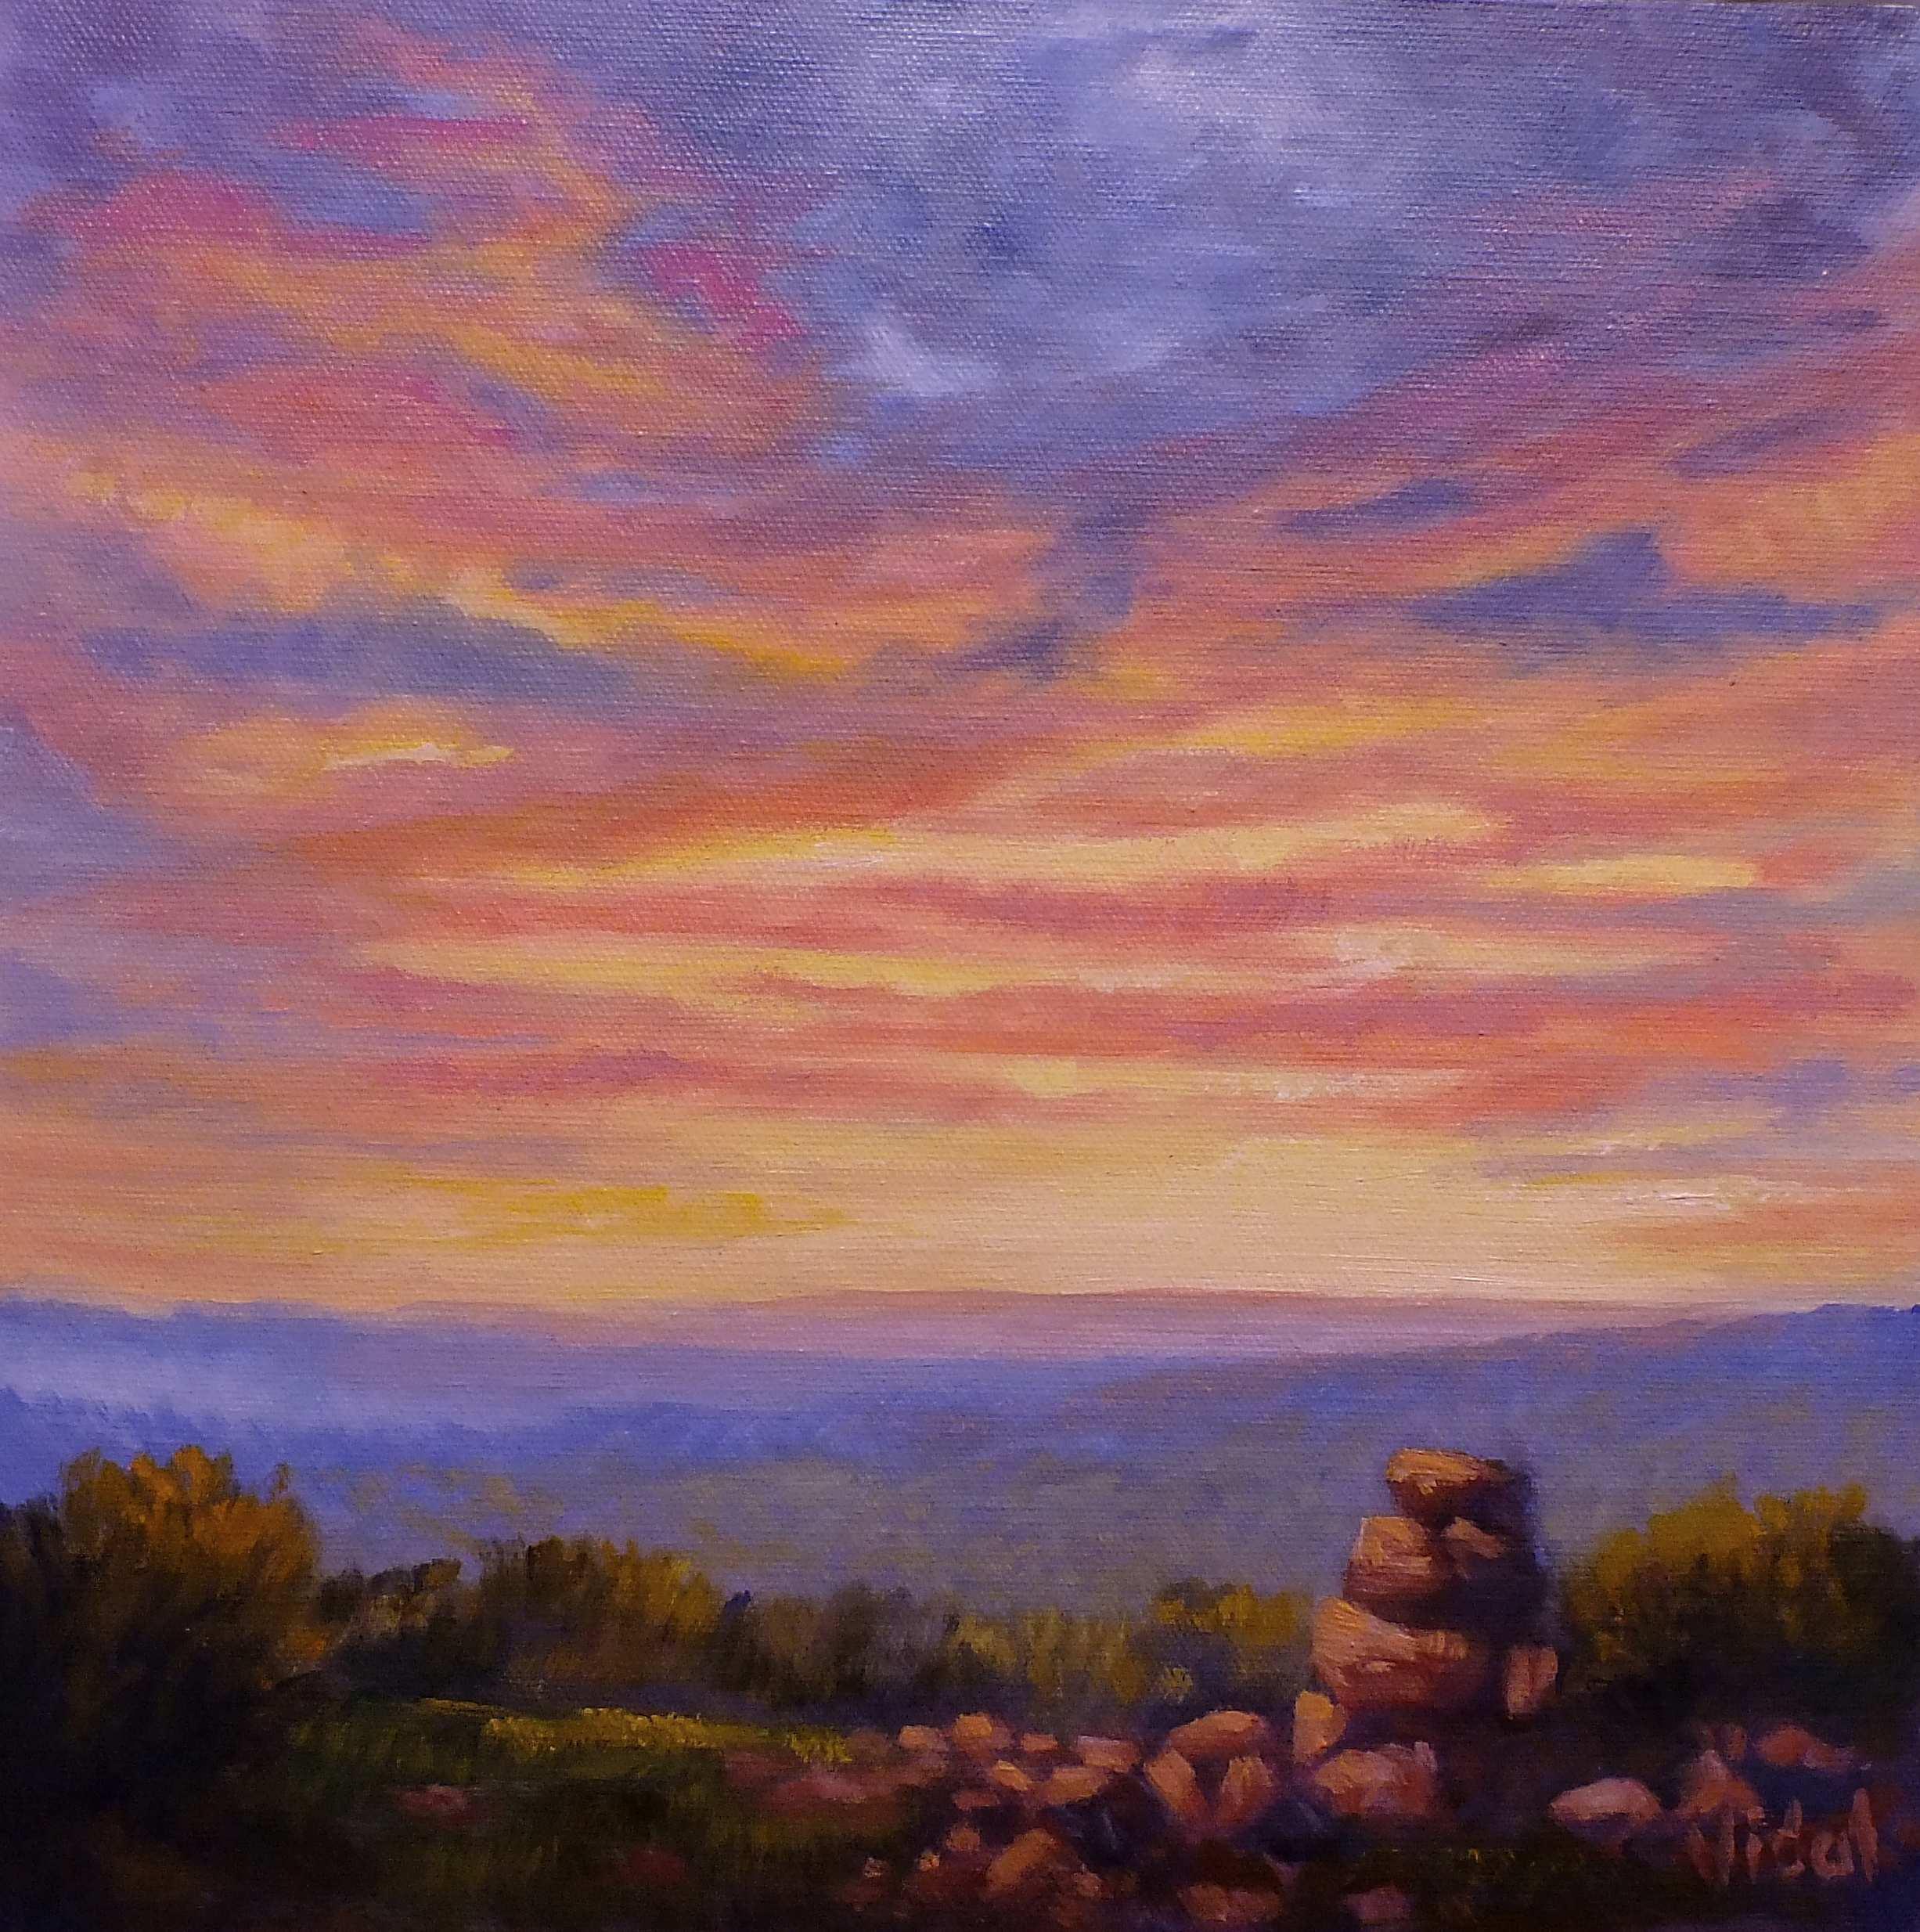 Sunset Sky- Oil Painting for Beginners